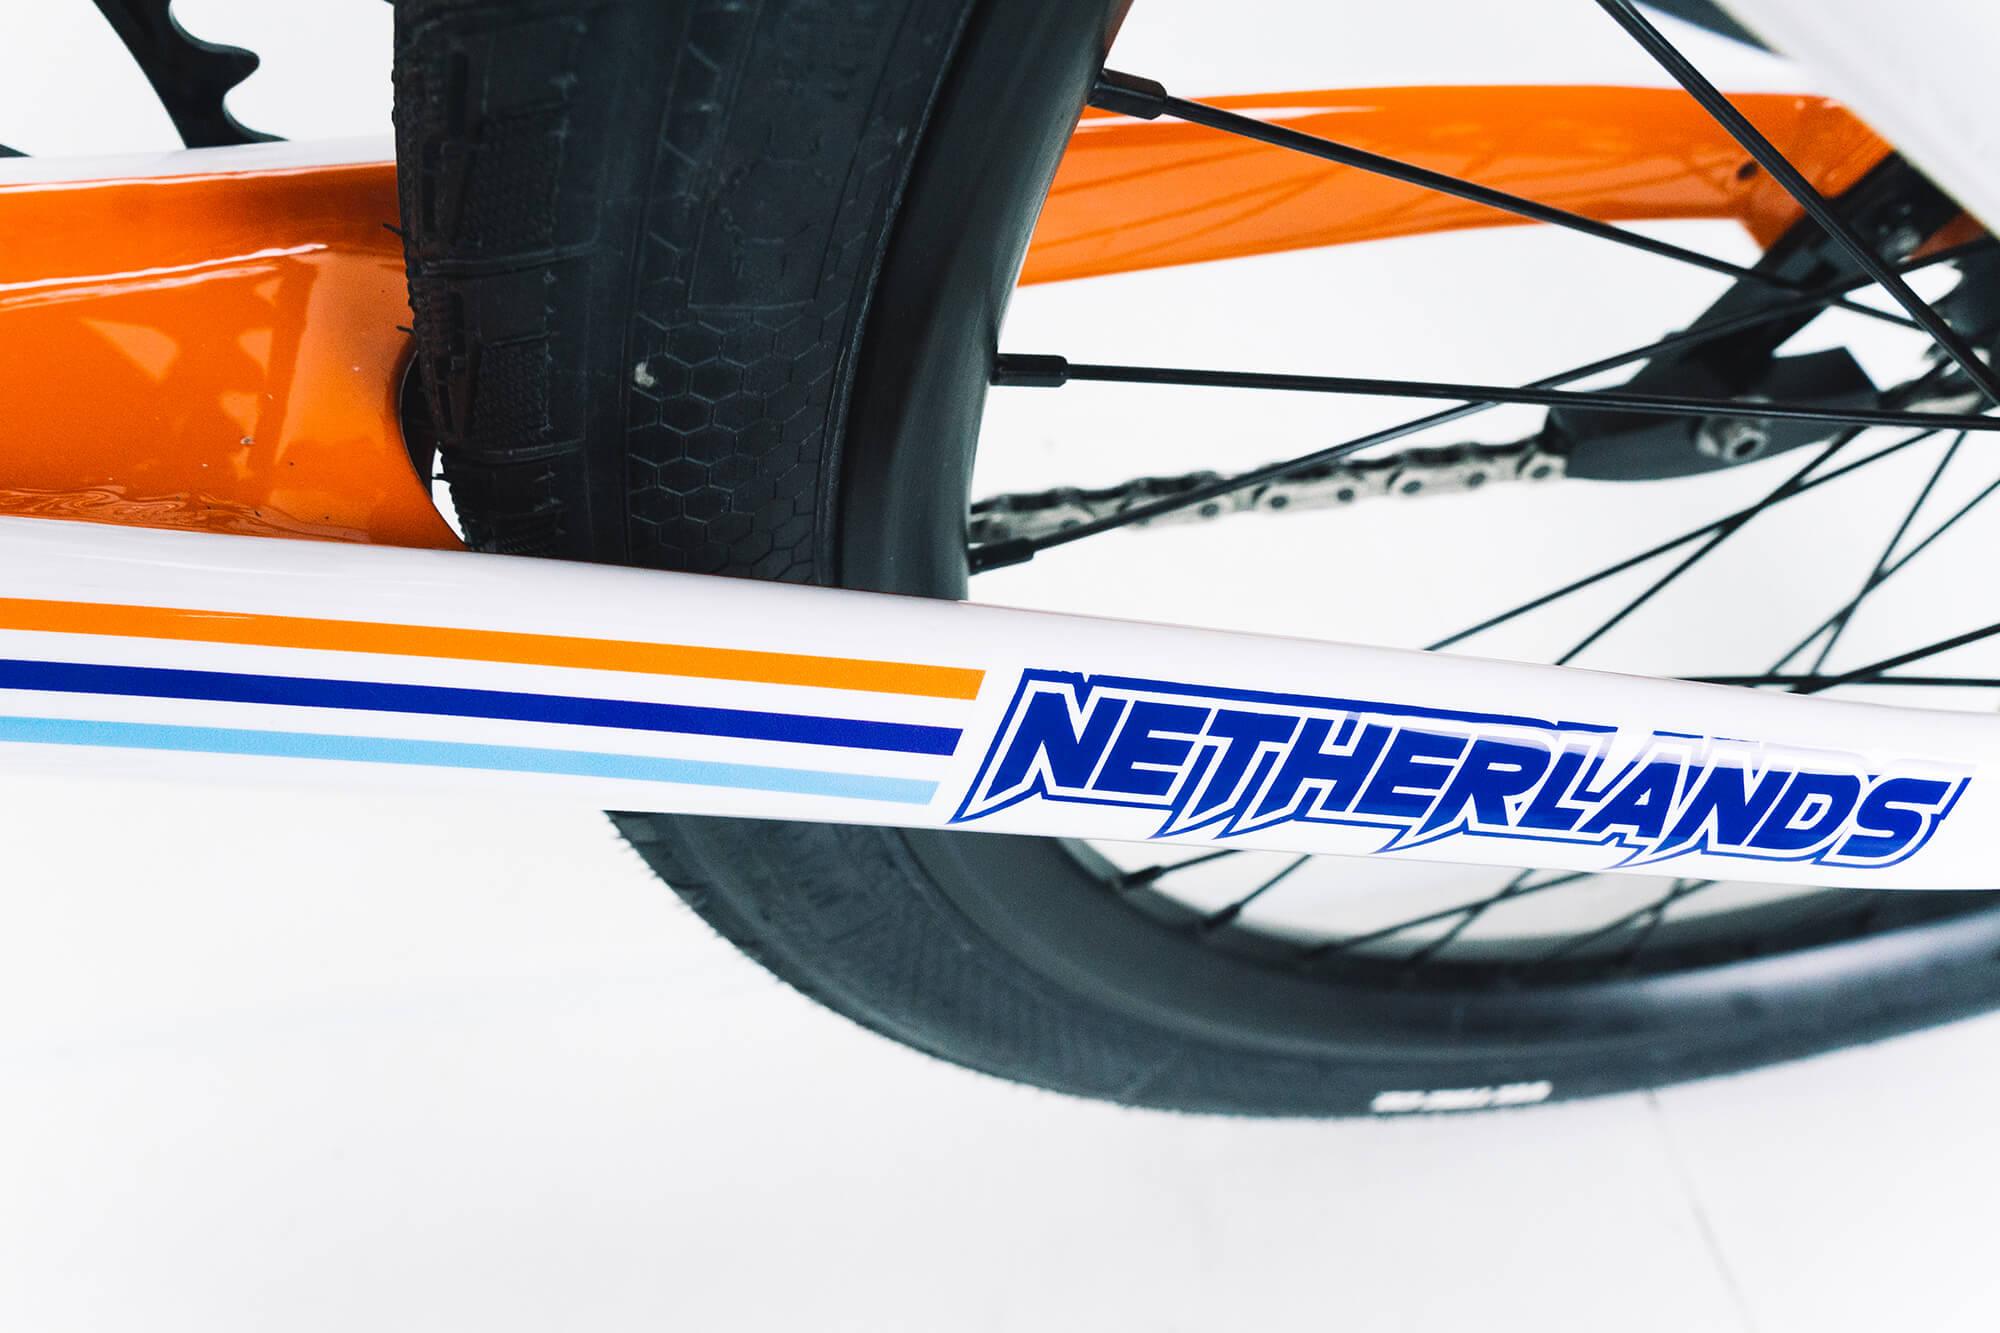 Niels Bensink Meybo OS20 Pump Track Worlds Custom 08